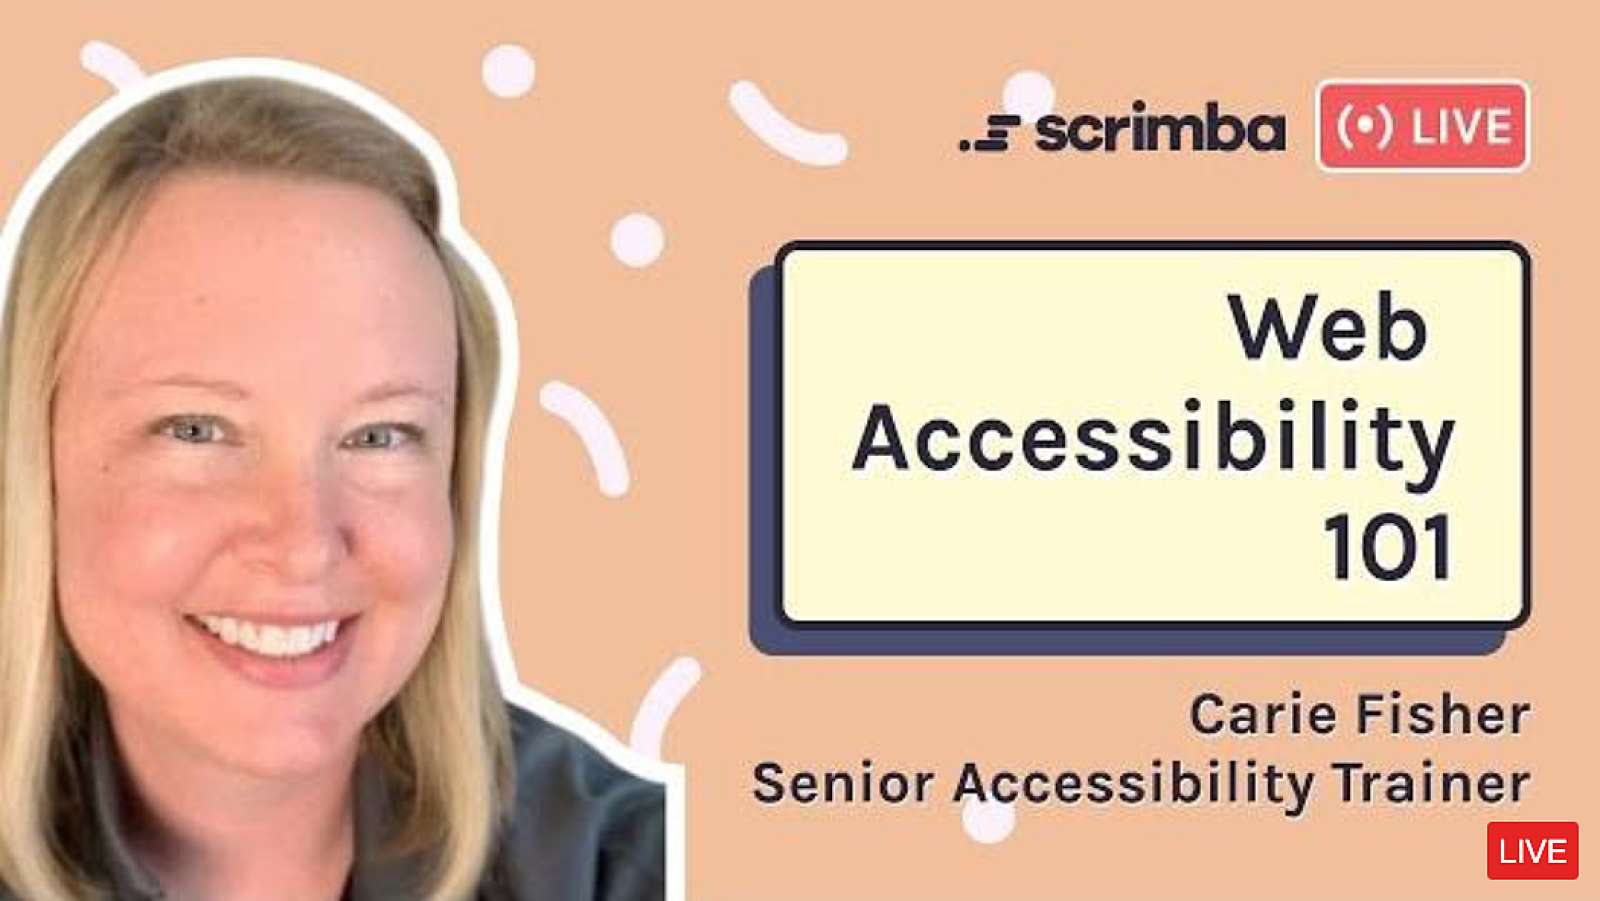 Web Accessibility 101